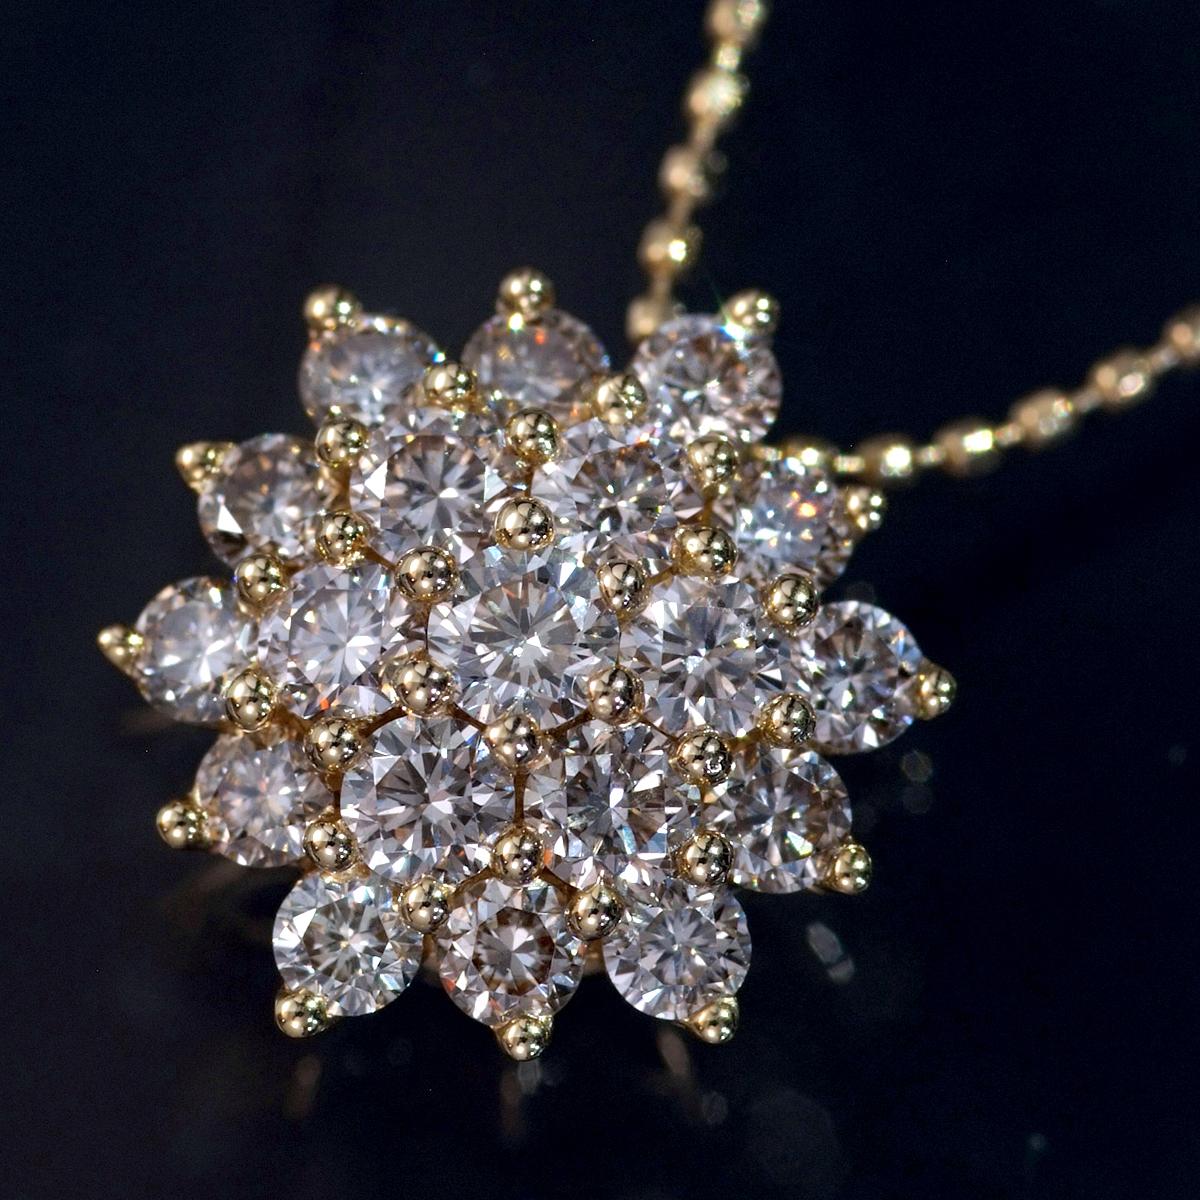 F0855 ファンシーブラウン天然絶品ダイヤモンド1.05ct 最高級18金無垢ネックレス フリーサイズ(最長50cm) 重量3.5g 幅13.5mm_画像1